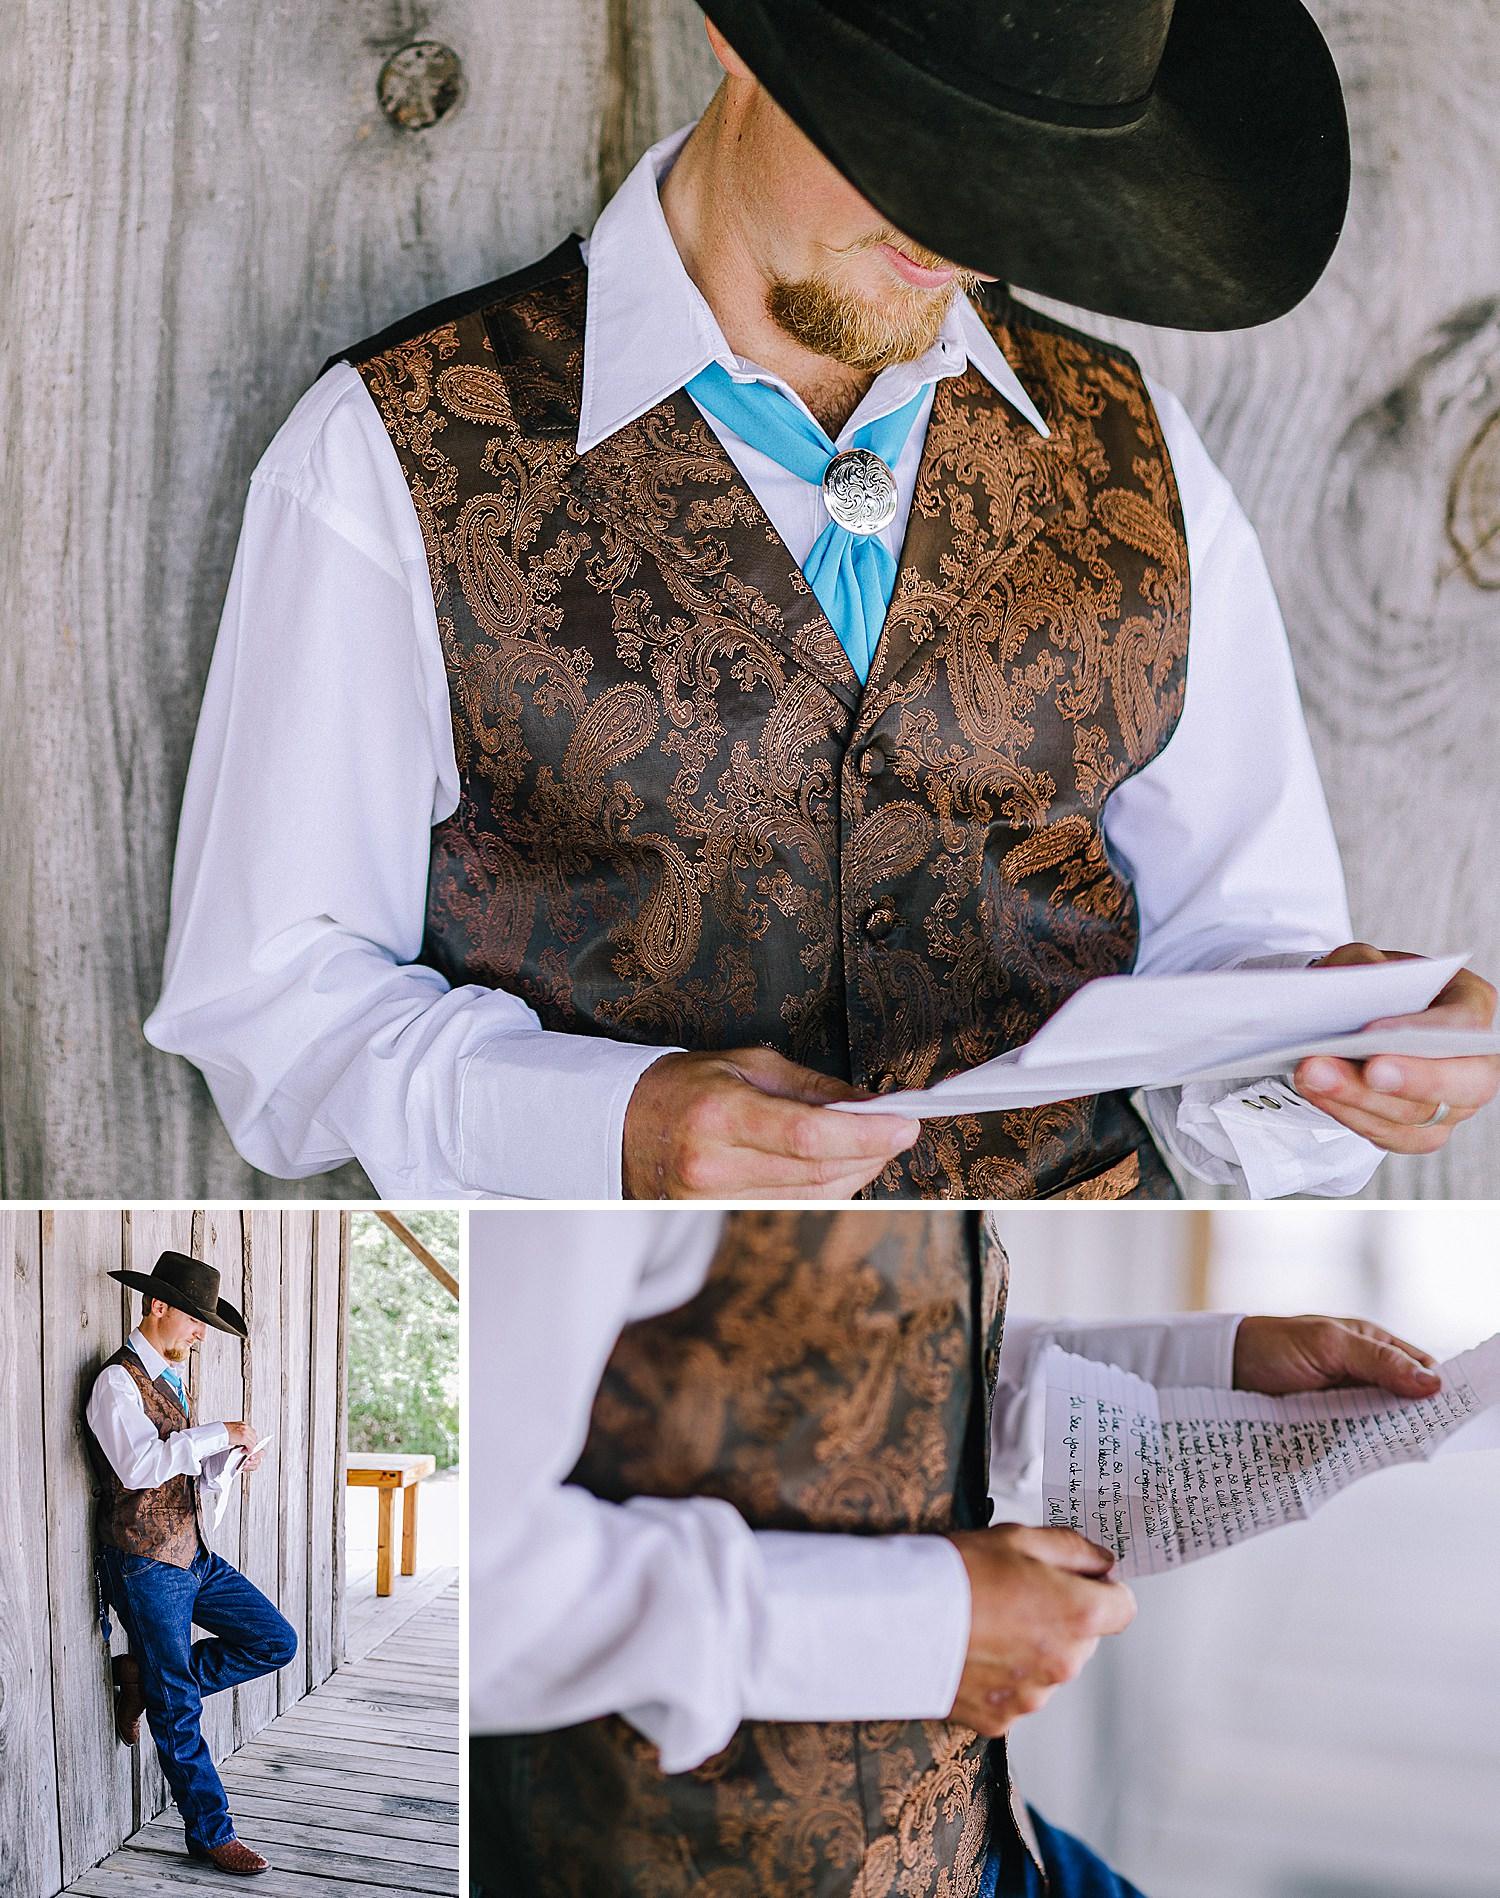 Carly-Barton-Photography-Old-Town-Texas-Rustic-Wedding-Photos-Sunflowers-Boots-Kyle-Texas_0025.jpg